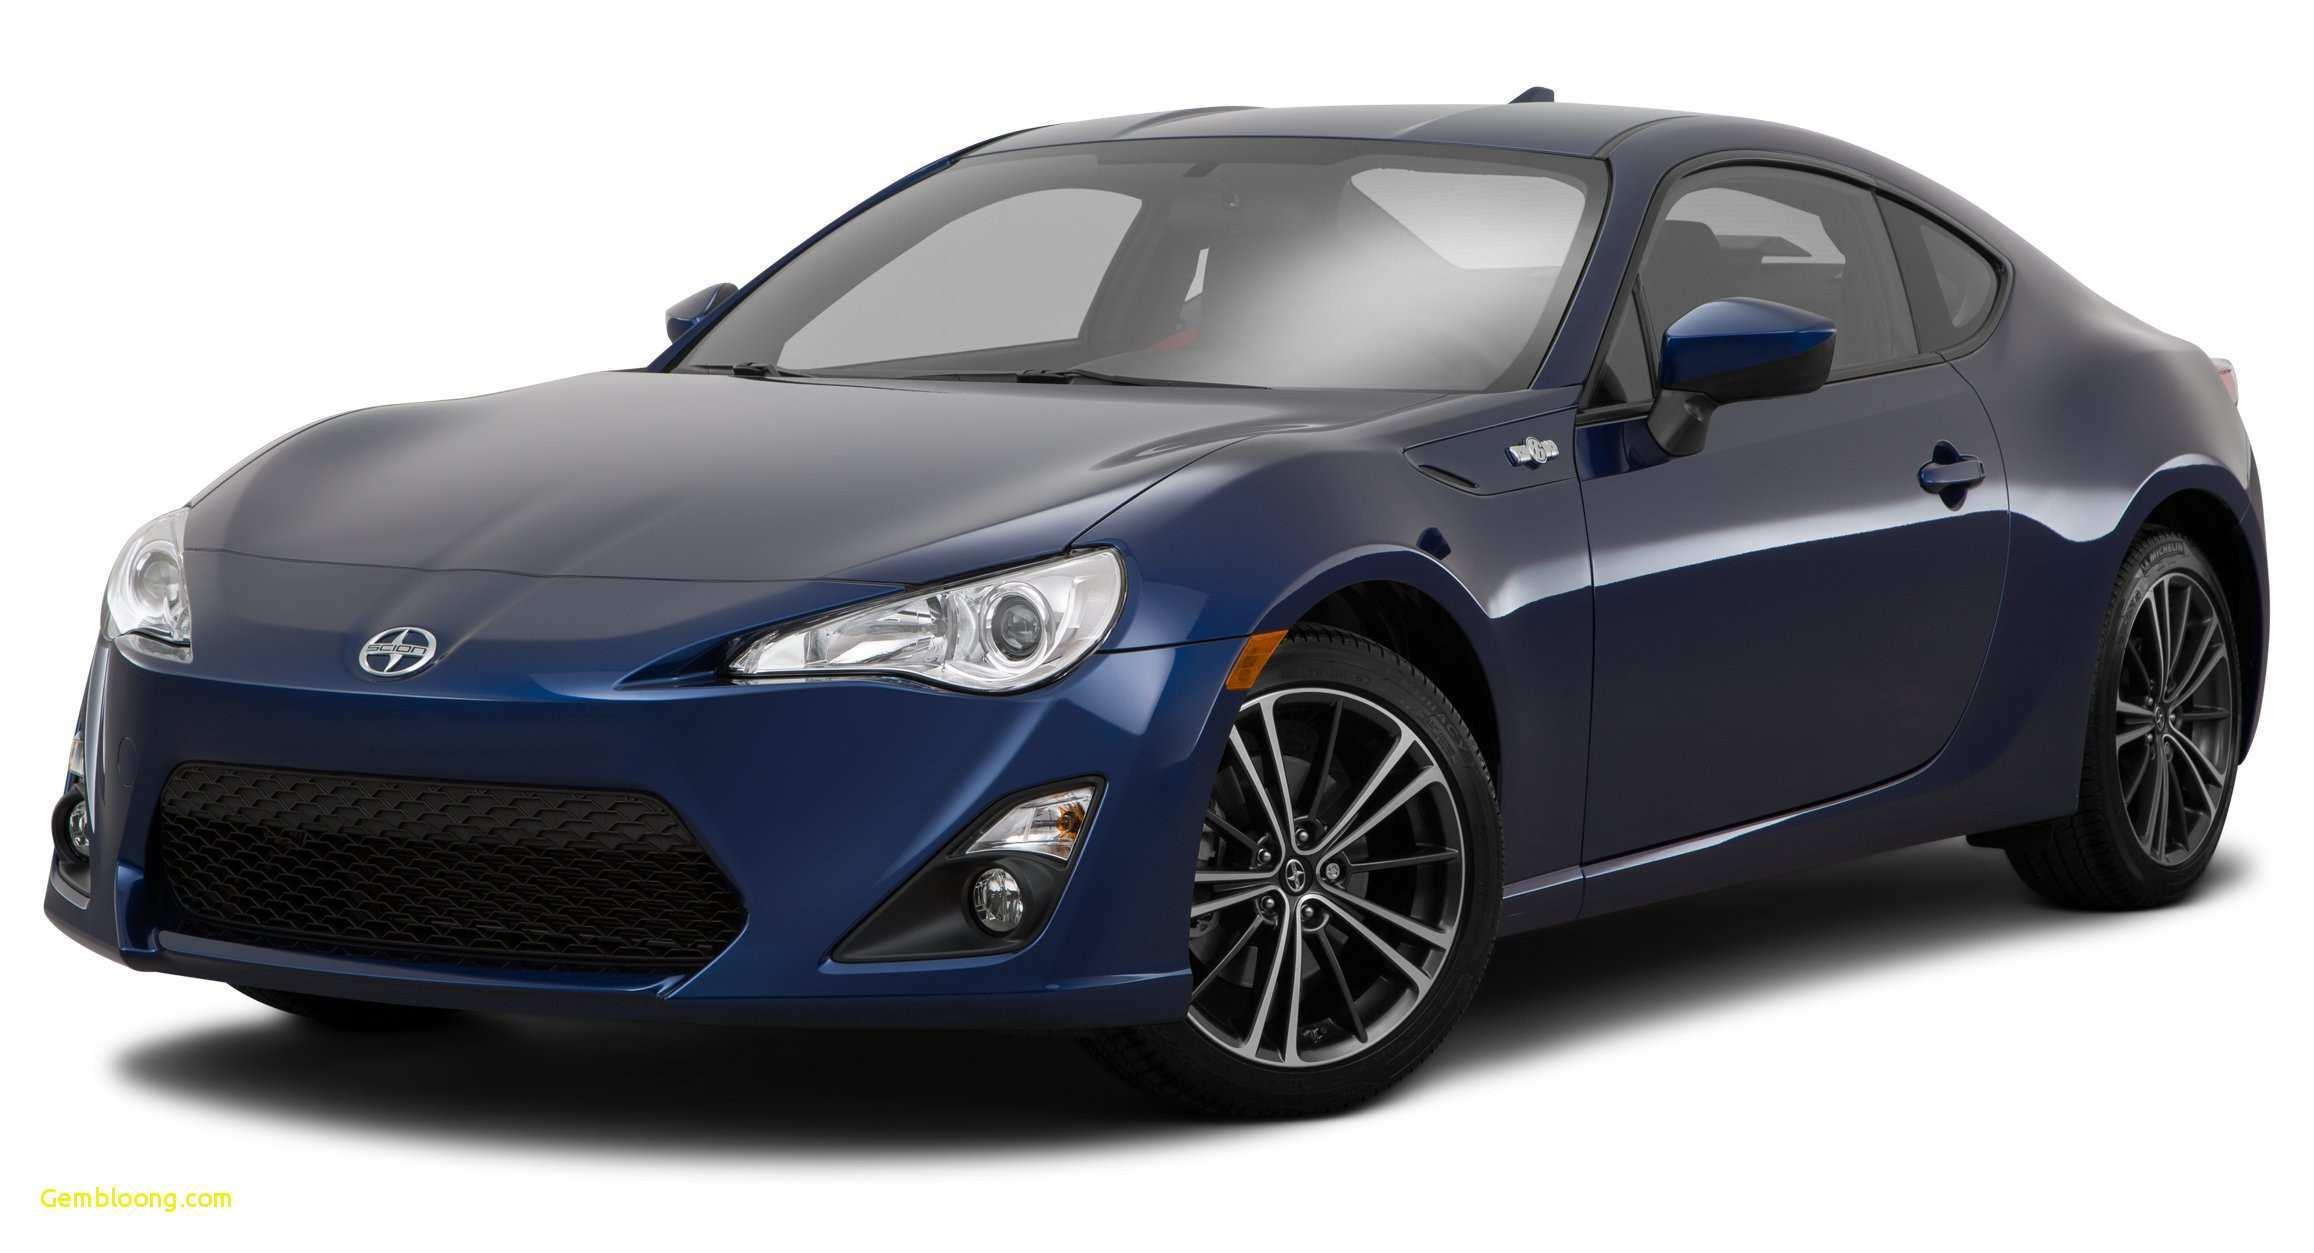 72 Best Review 2020 Scion FR S Sedan Speed Test with 2020 Scion FR S Sedan